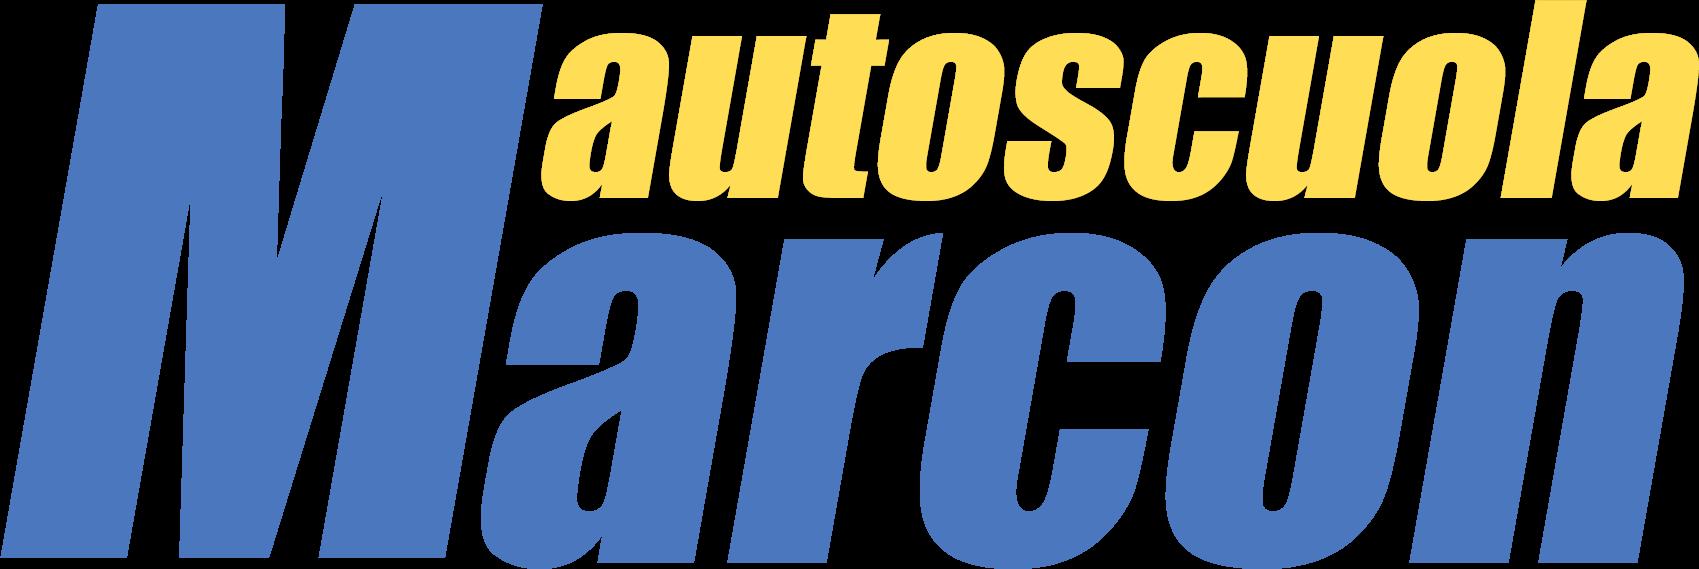 Autoscuola Marcon